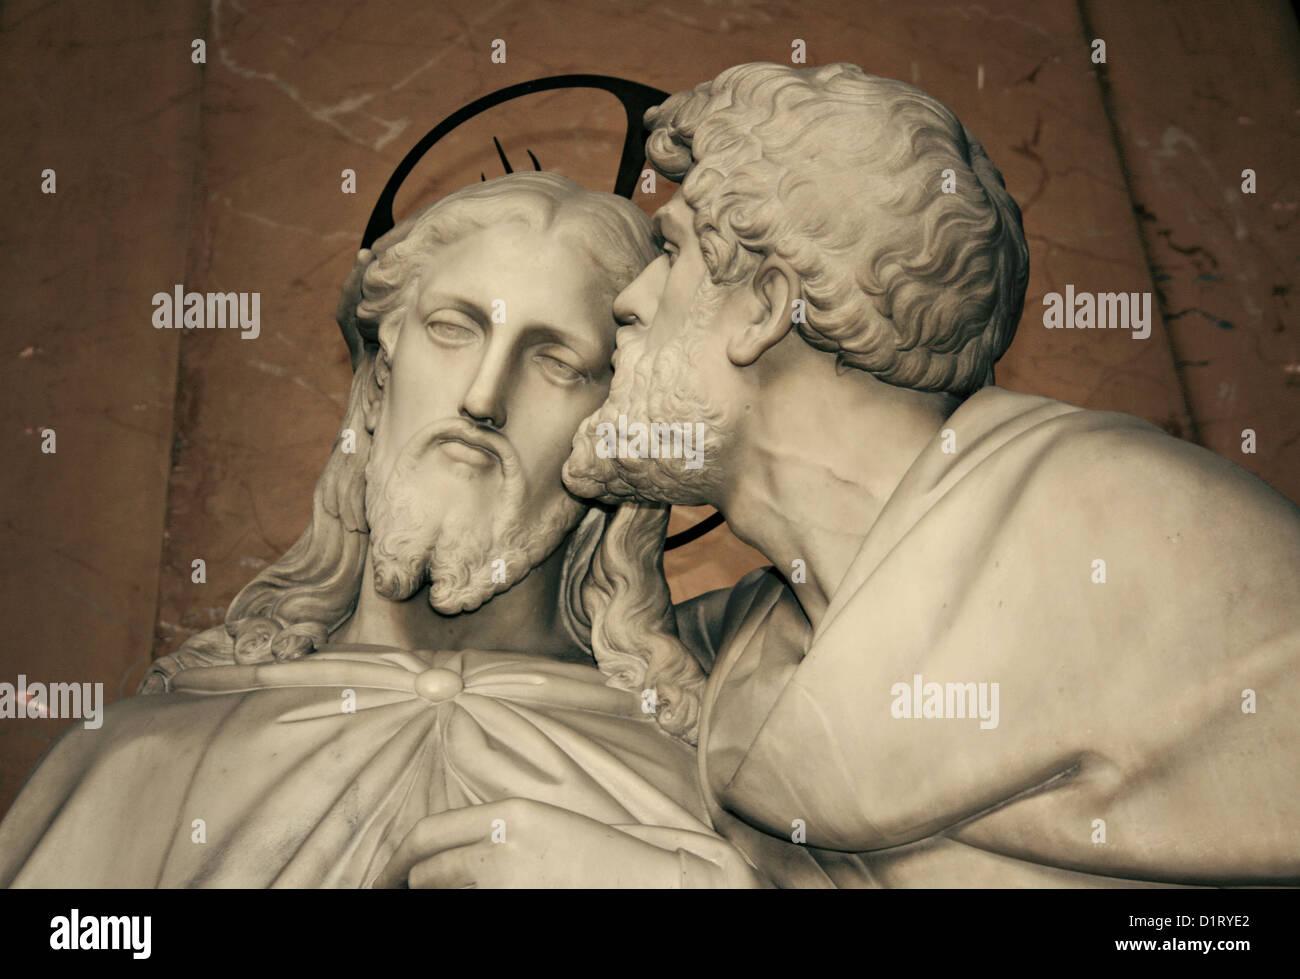 Kiss of Judas. Marble statue beside the Scala Sancta in the Lateran Palace, Jesus and Judas - Stock Image